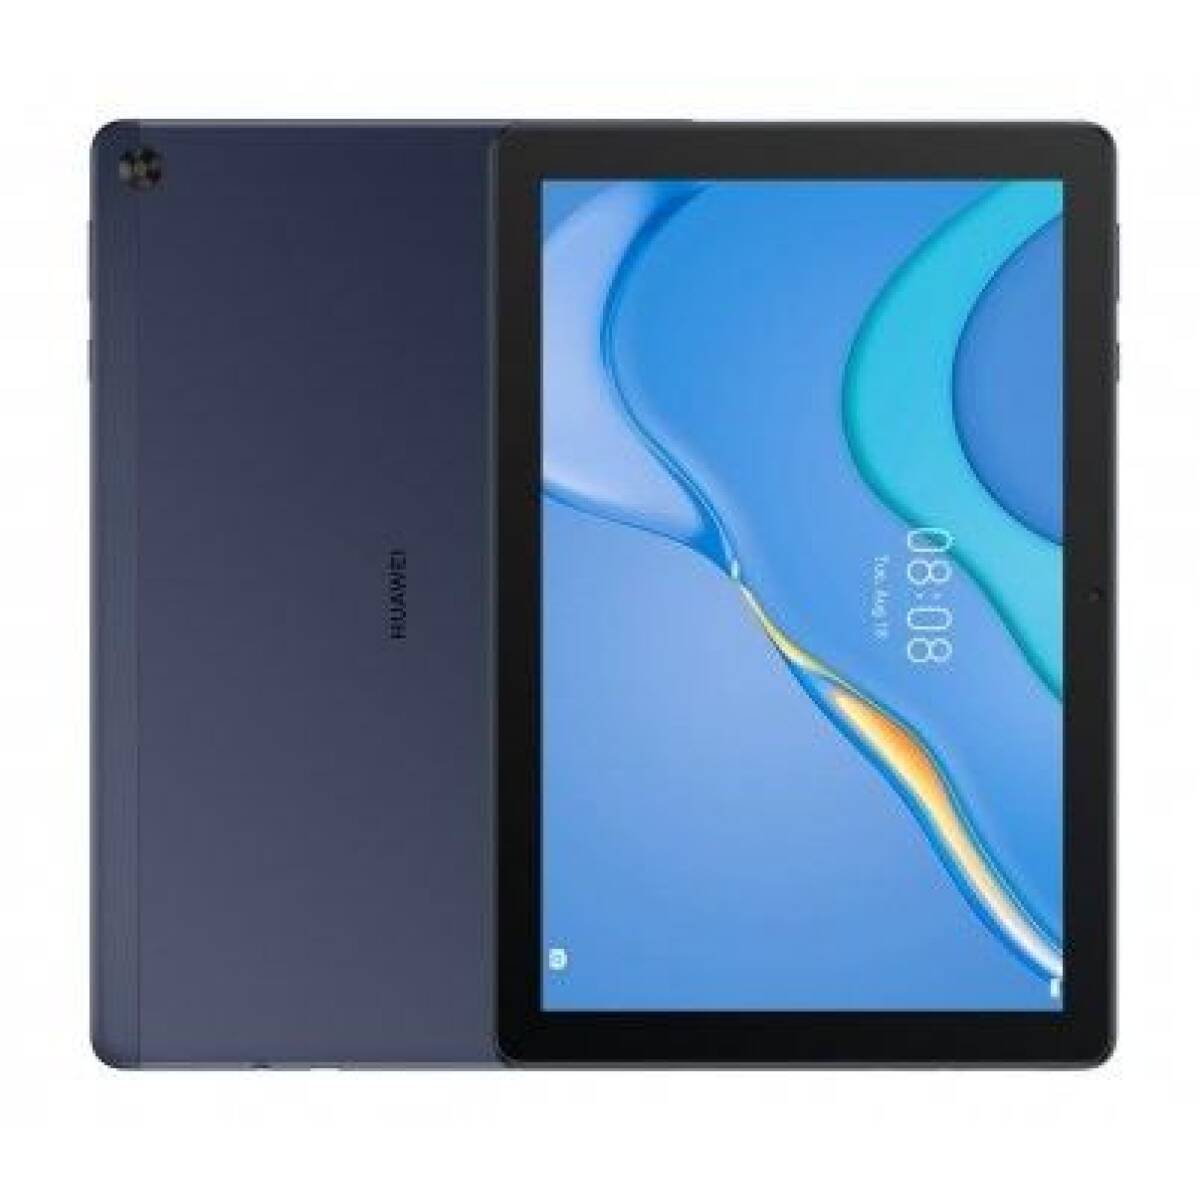 Tablet Huawei Matepad T10 Wifi  - 4G